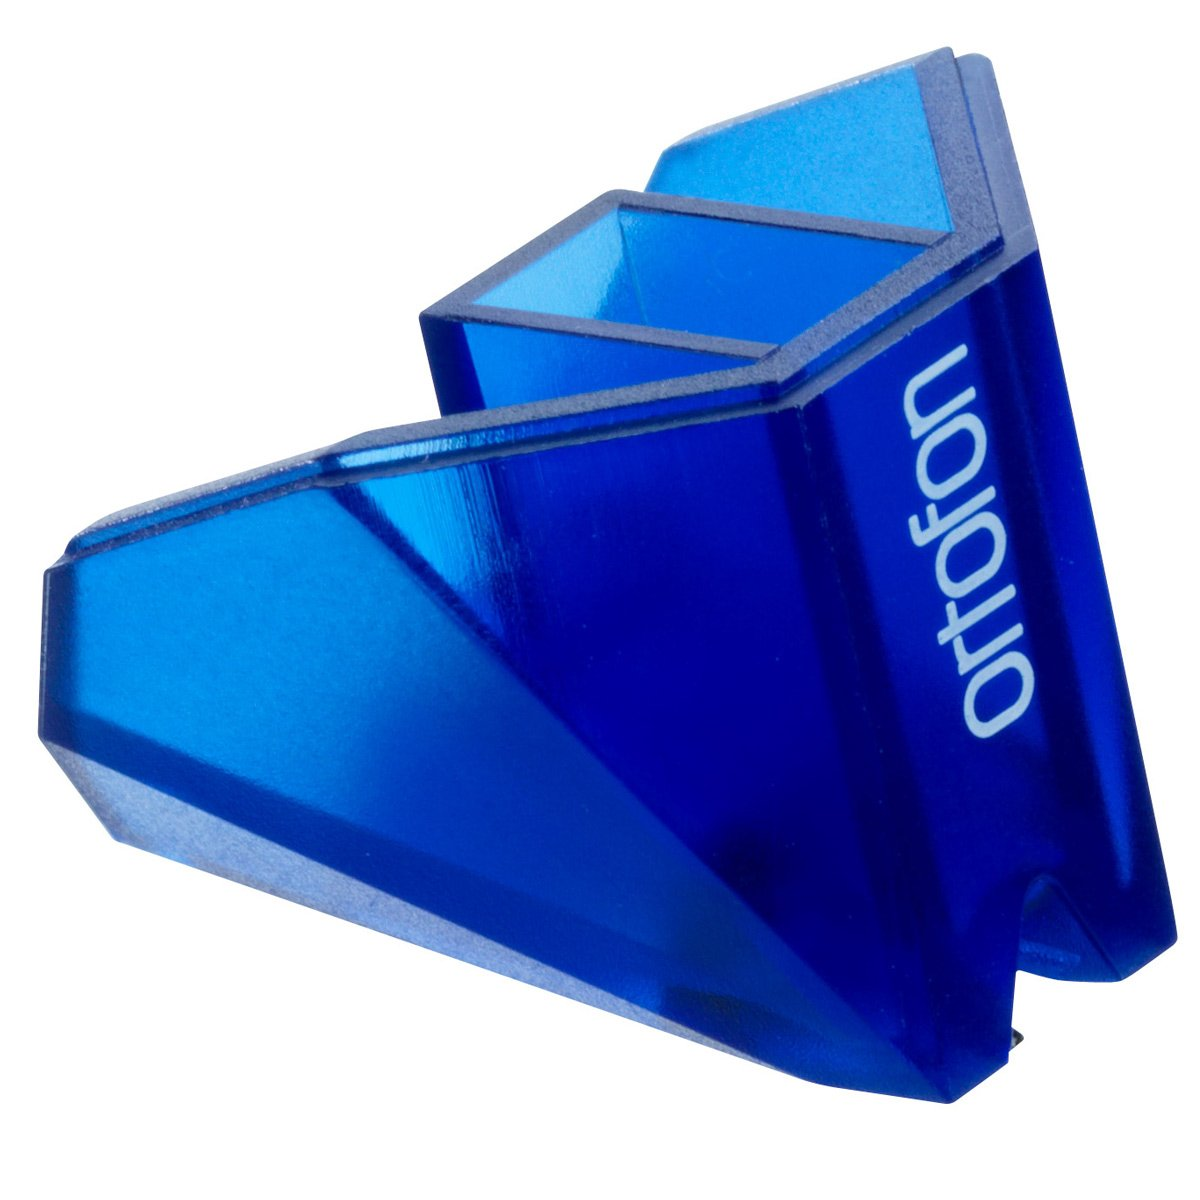 Pua Ortofon Stylus 2M azul